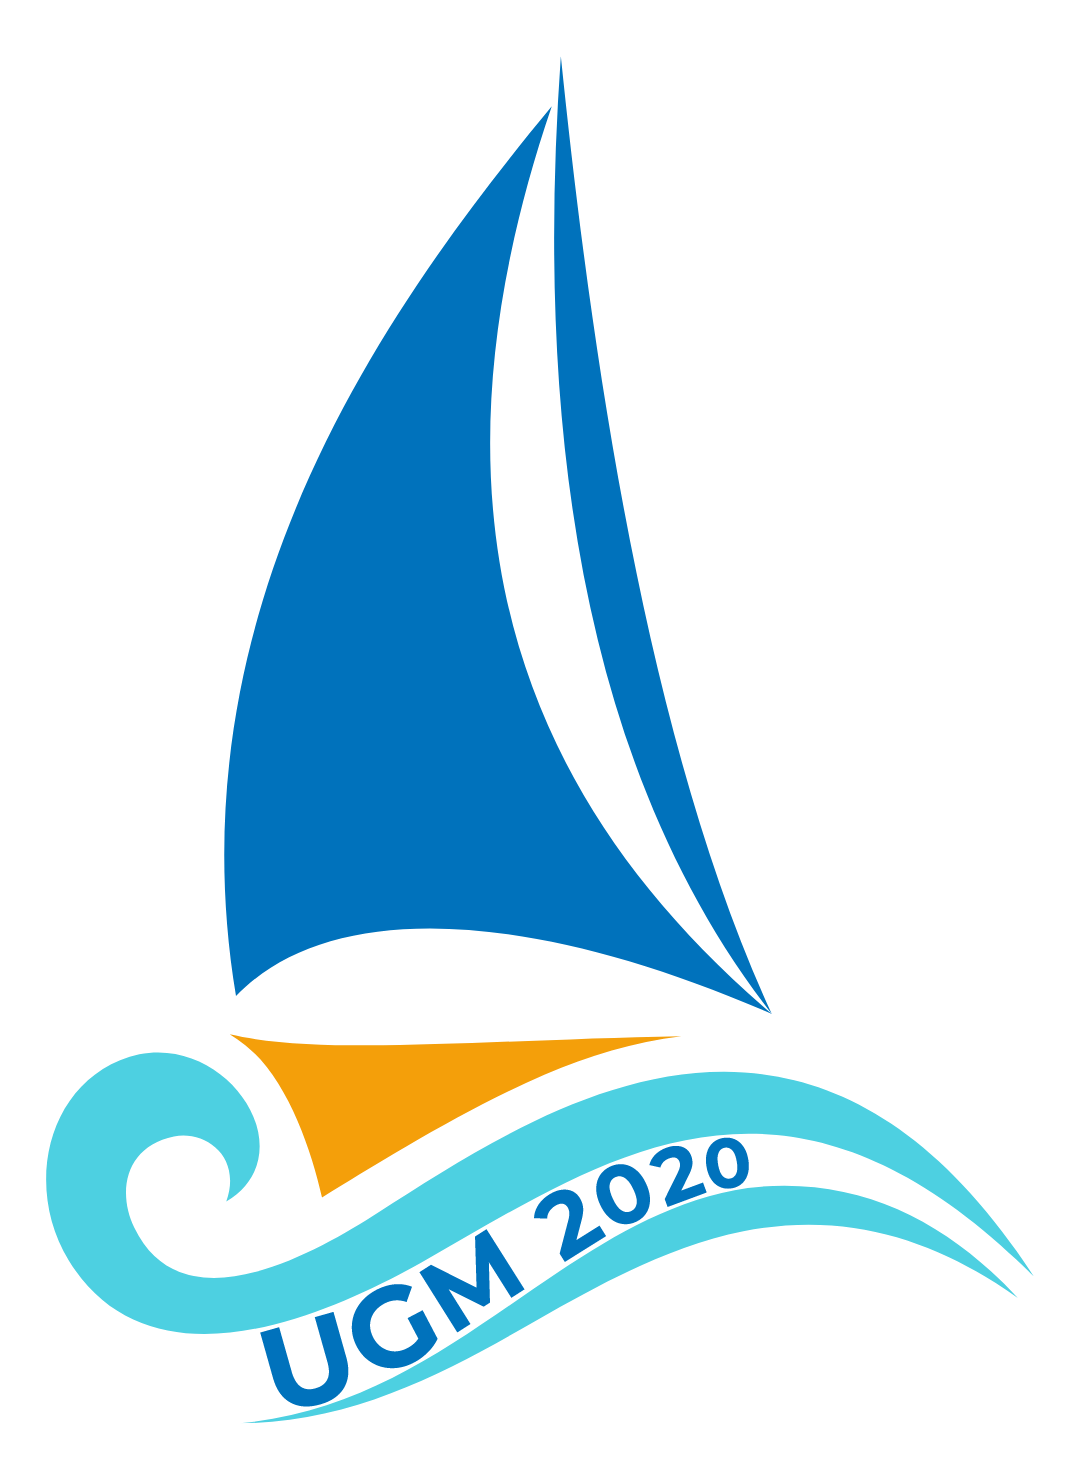 netsapiens ugm 2020 logo